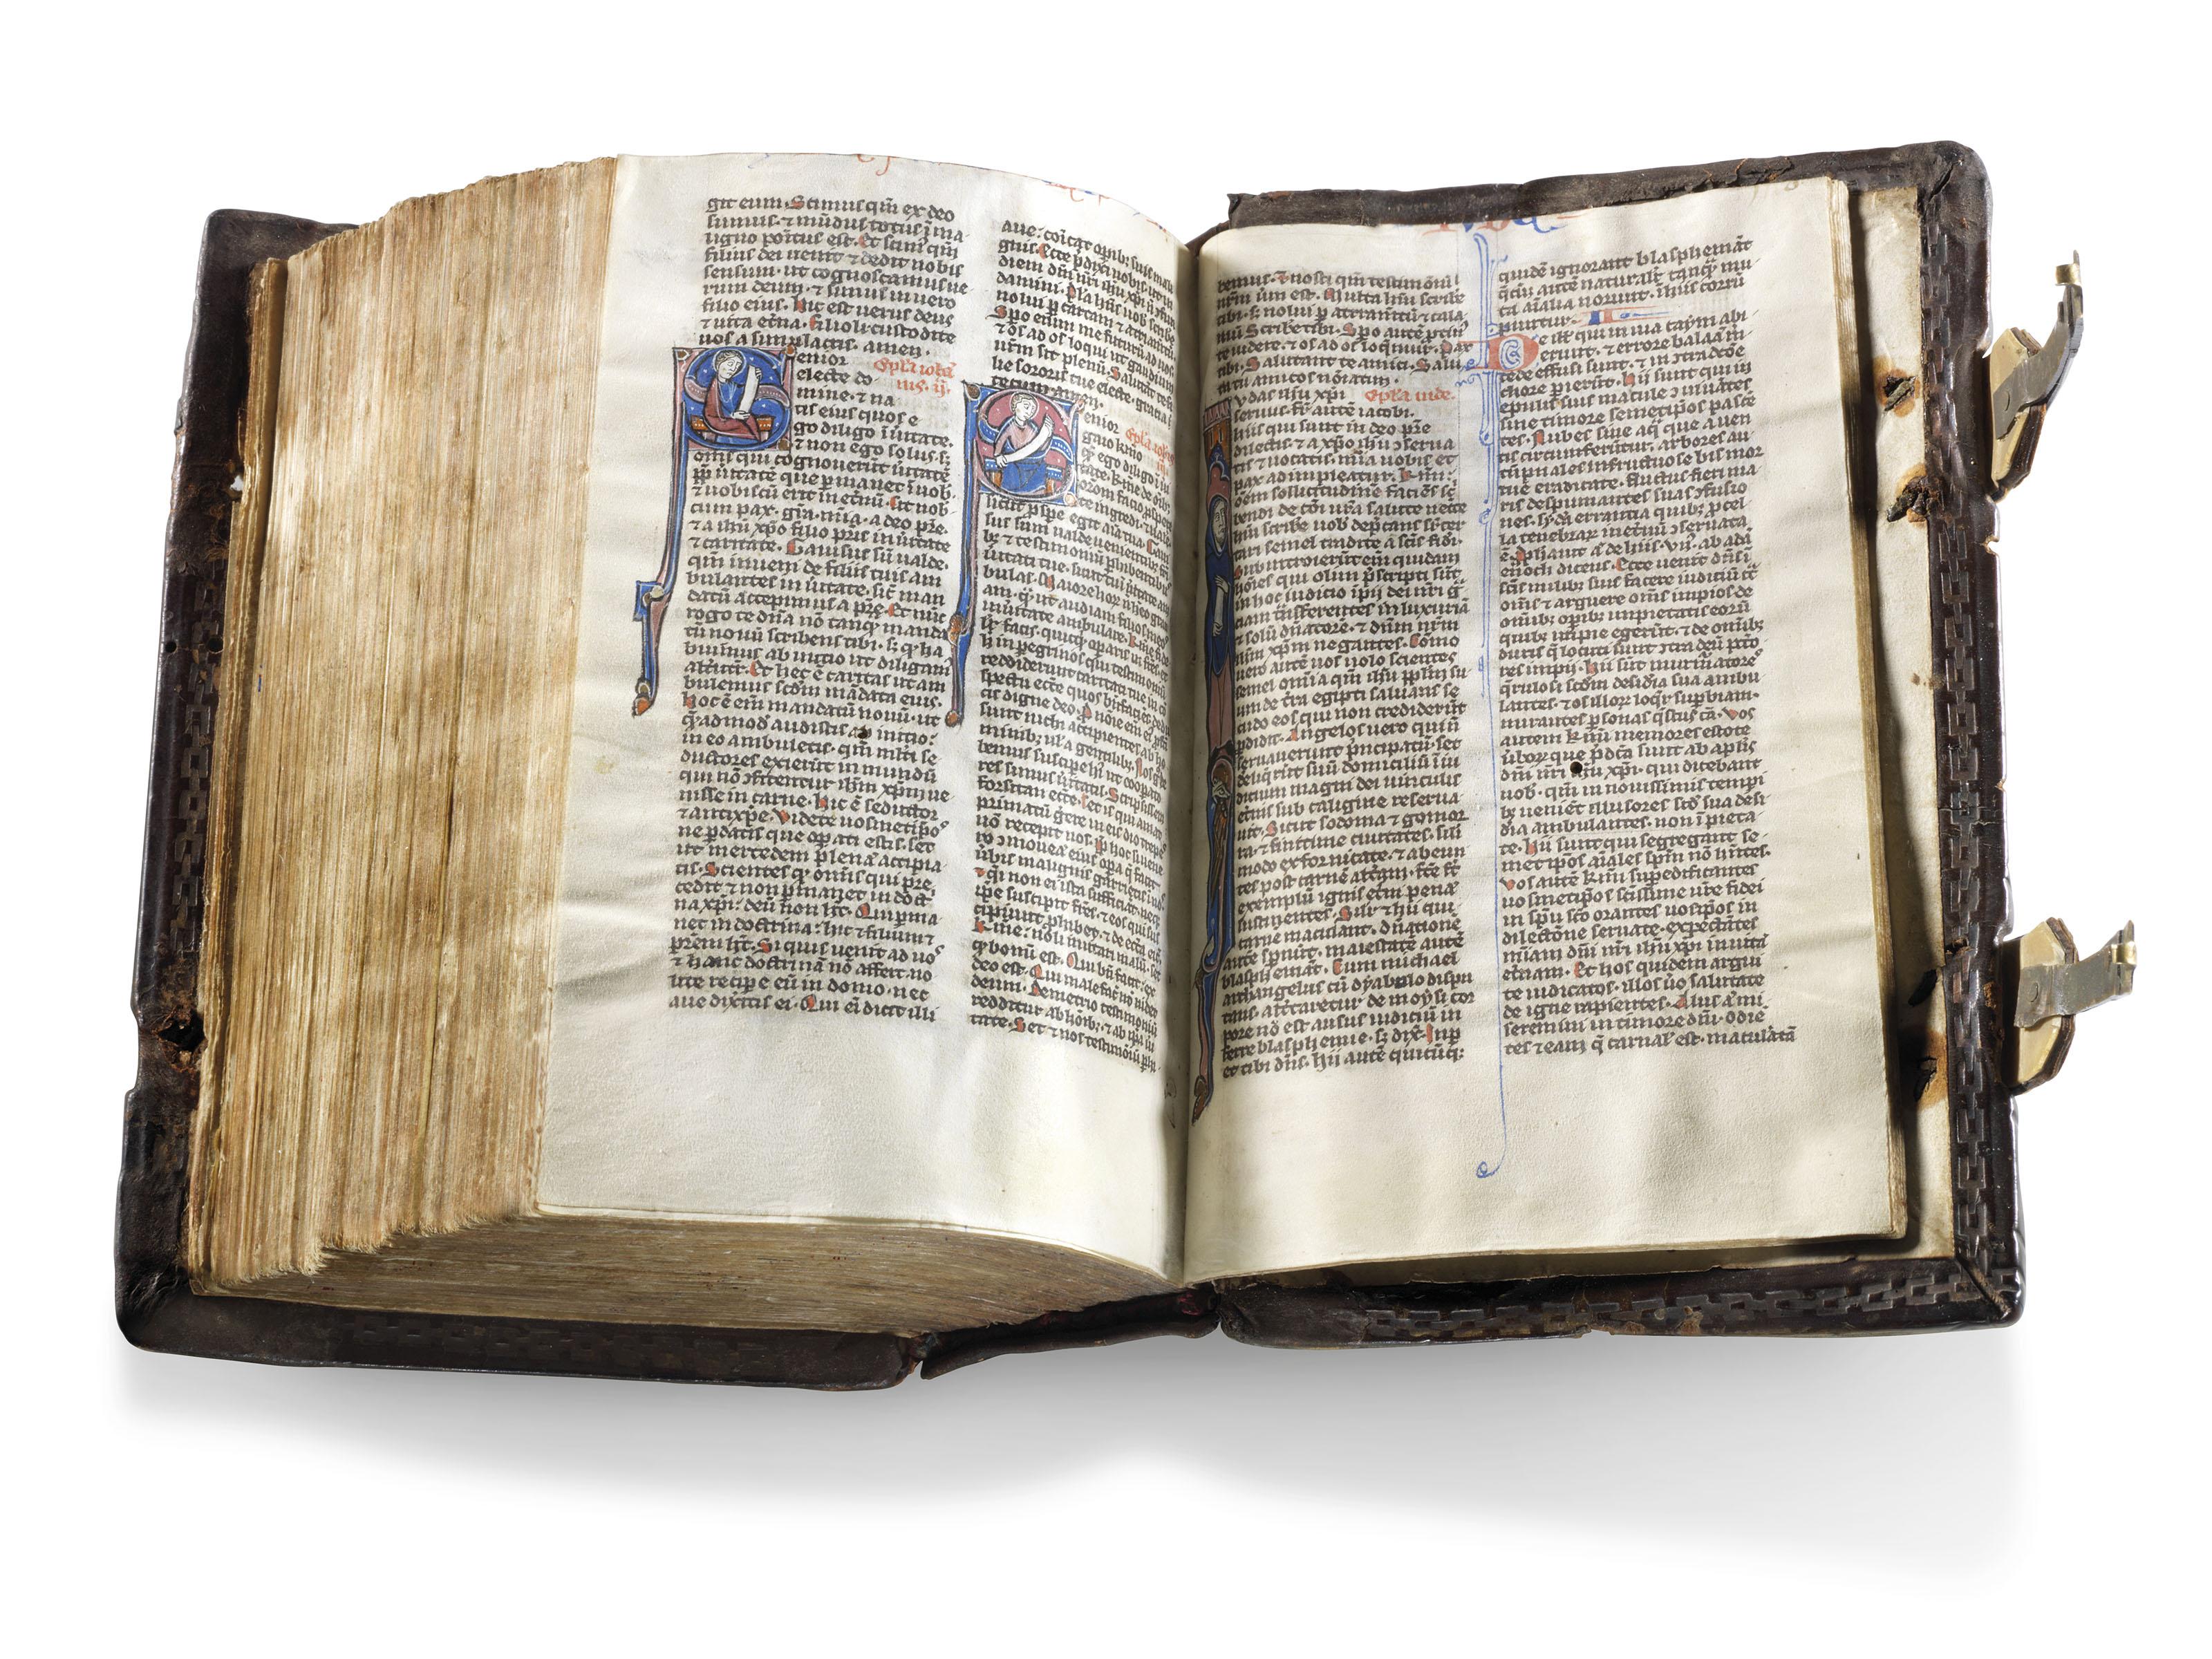 BIBLE, with Prologues, in Latin, illuminated manuscript on vellum [Paris, mid-13th century]